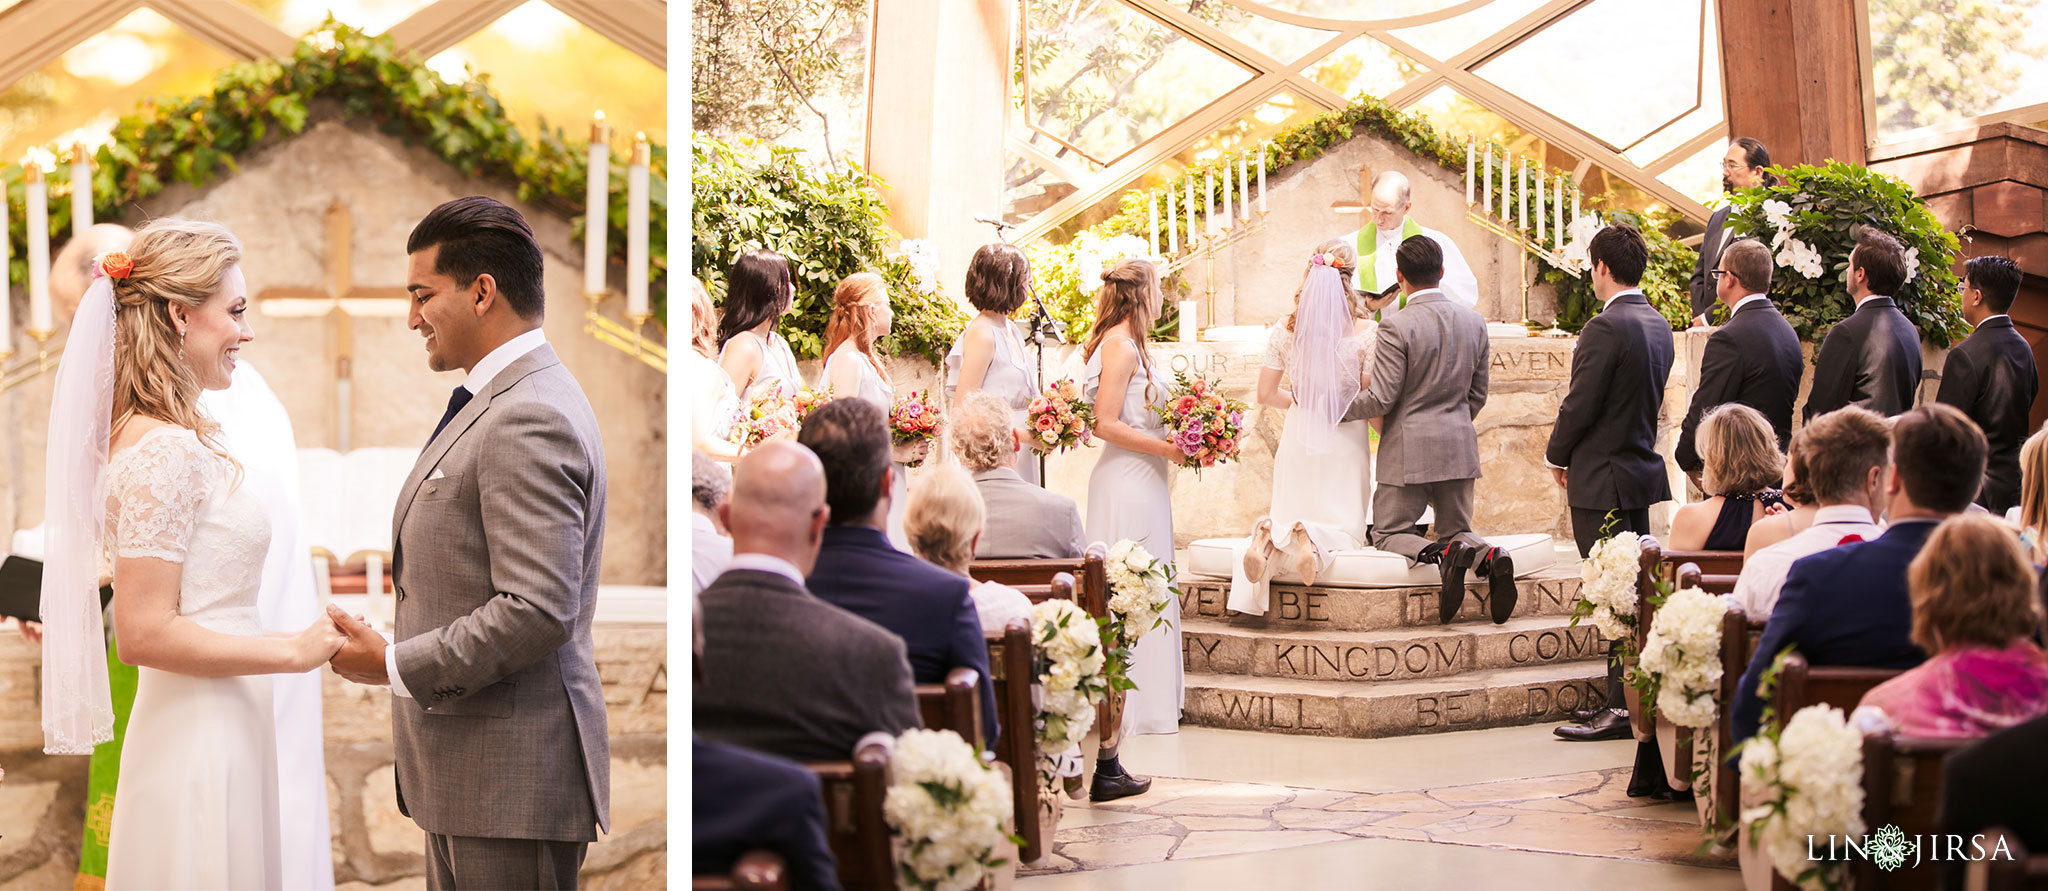 22 wayfarers chapel palos verdes wedding photography